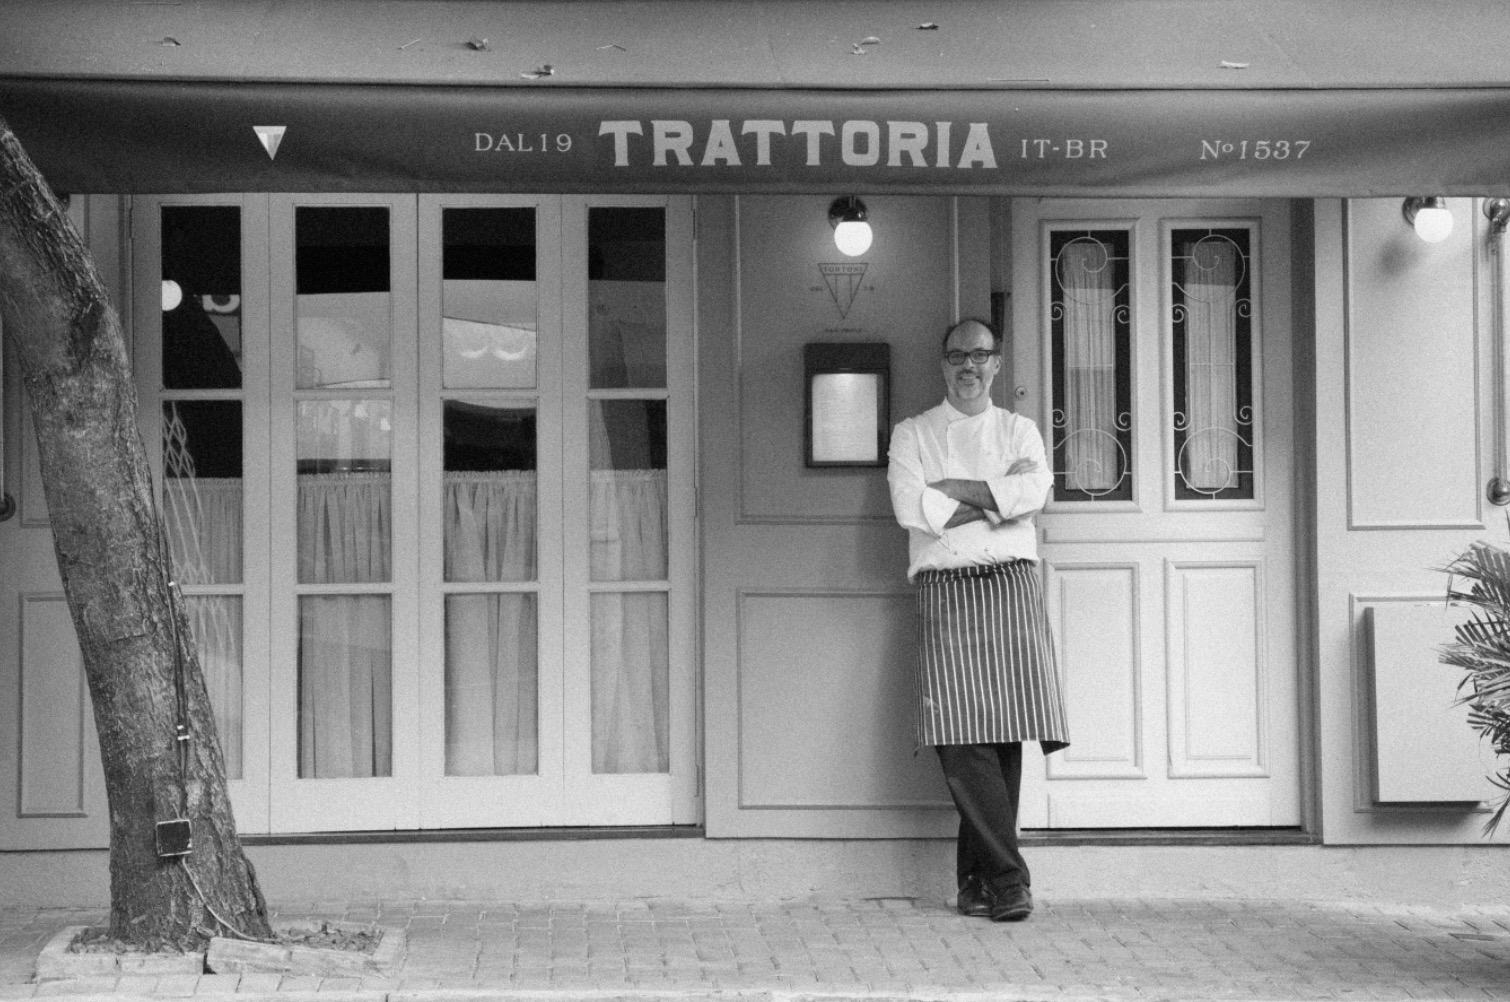 Tontoni Trattoria 11.jpg